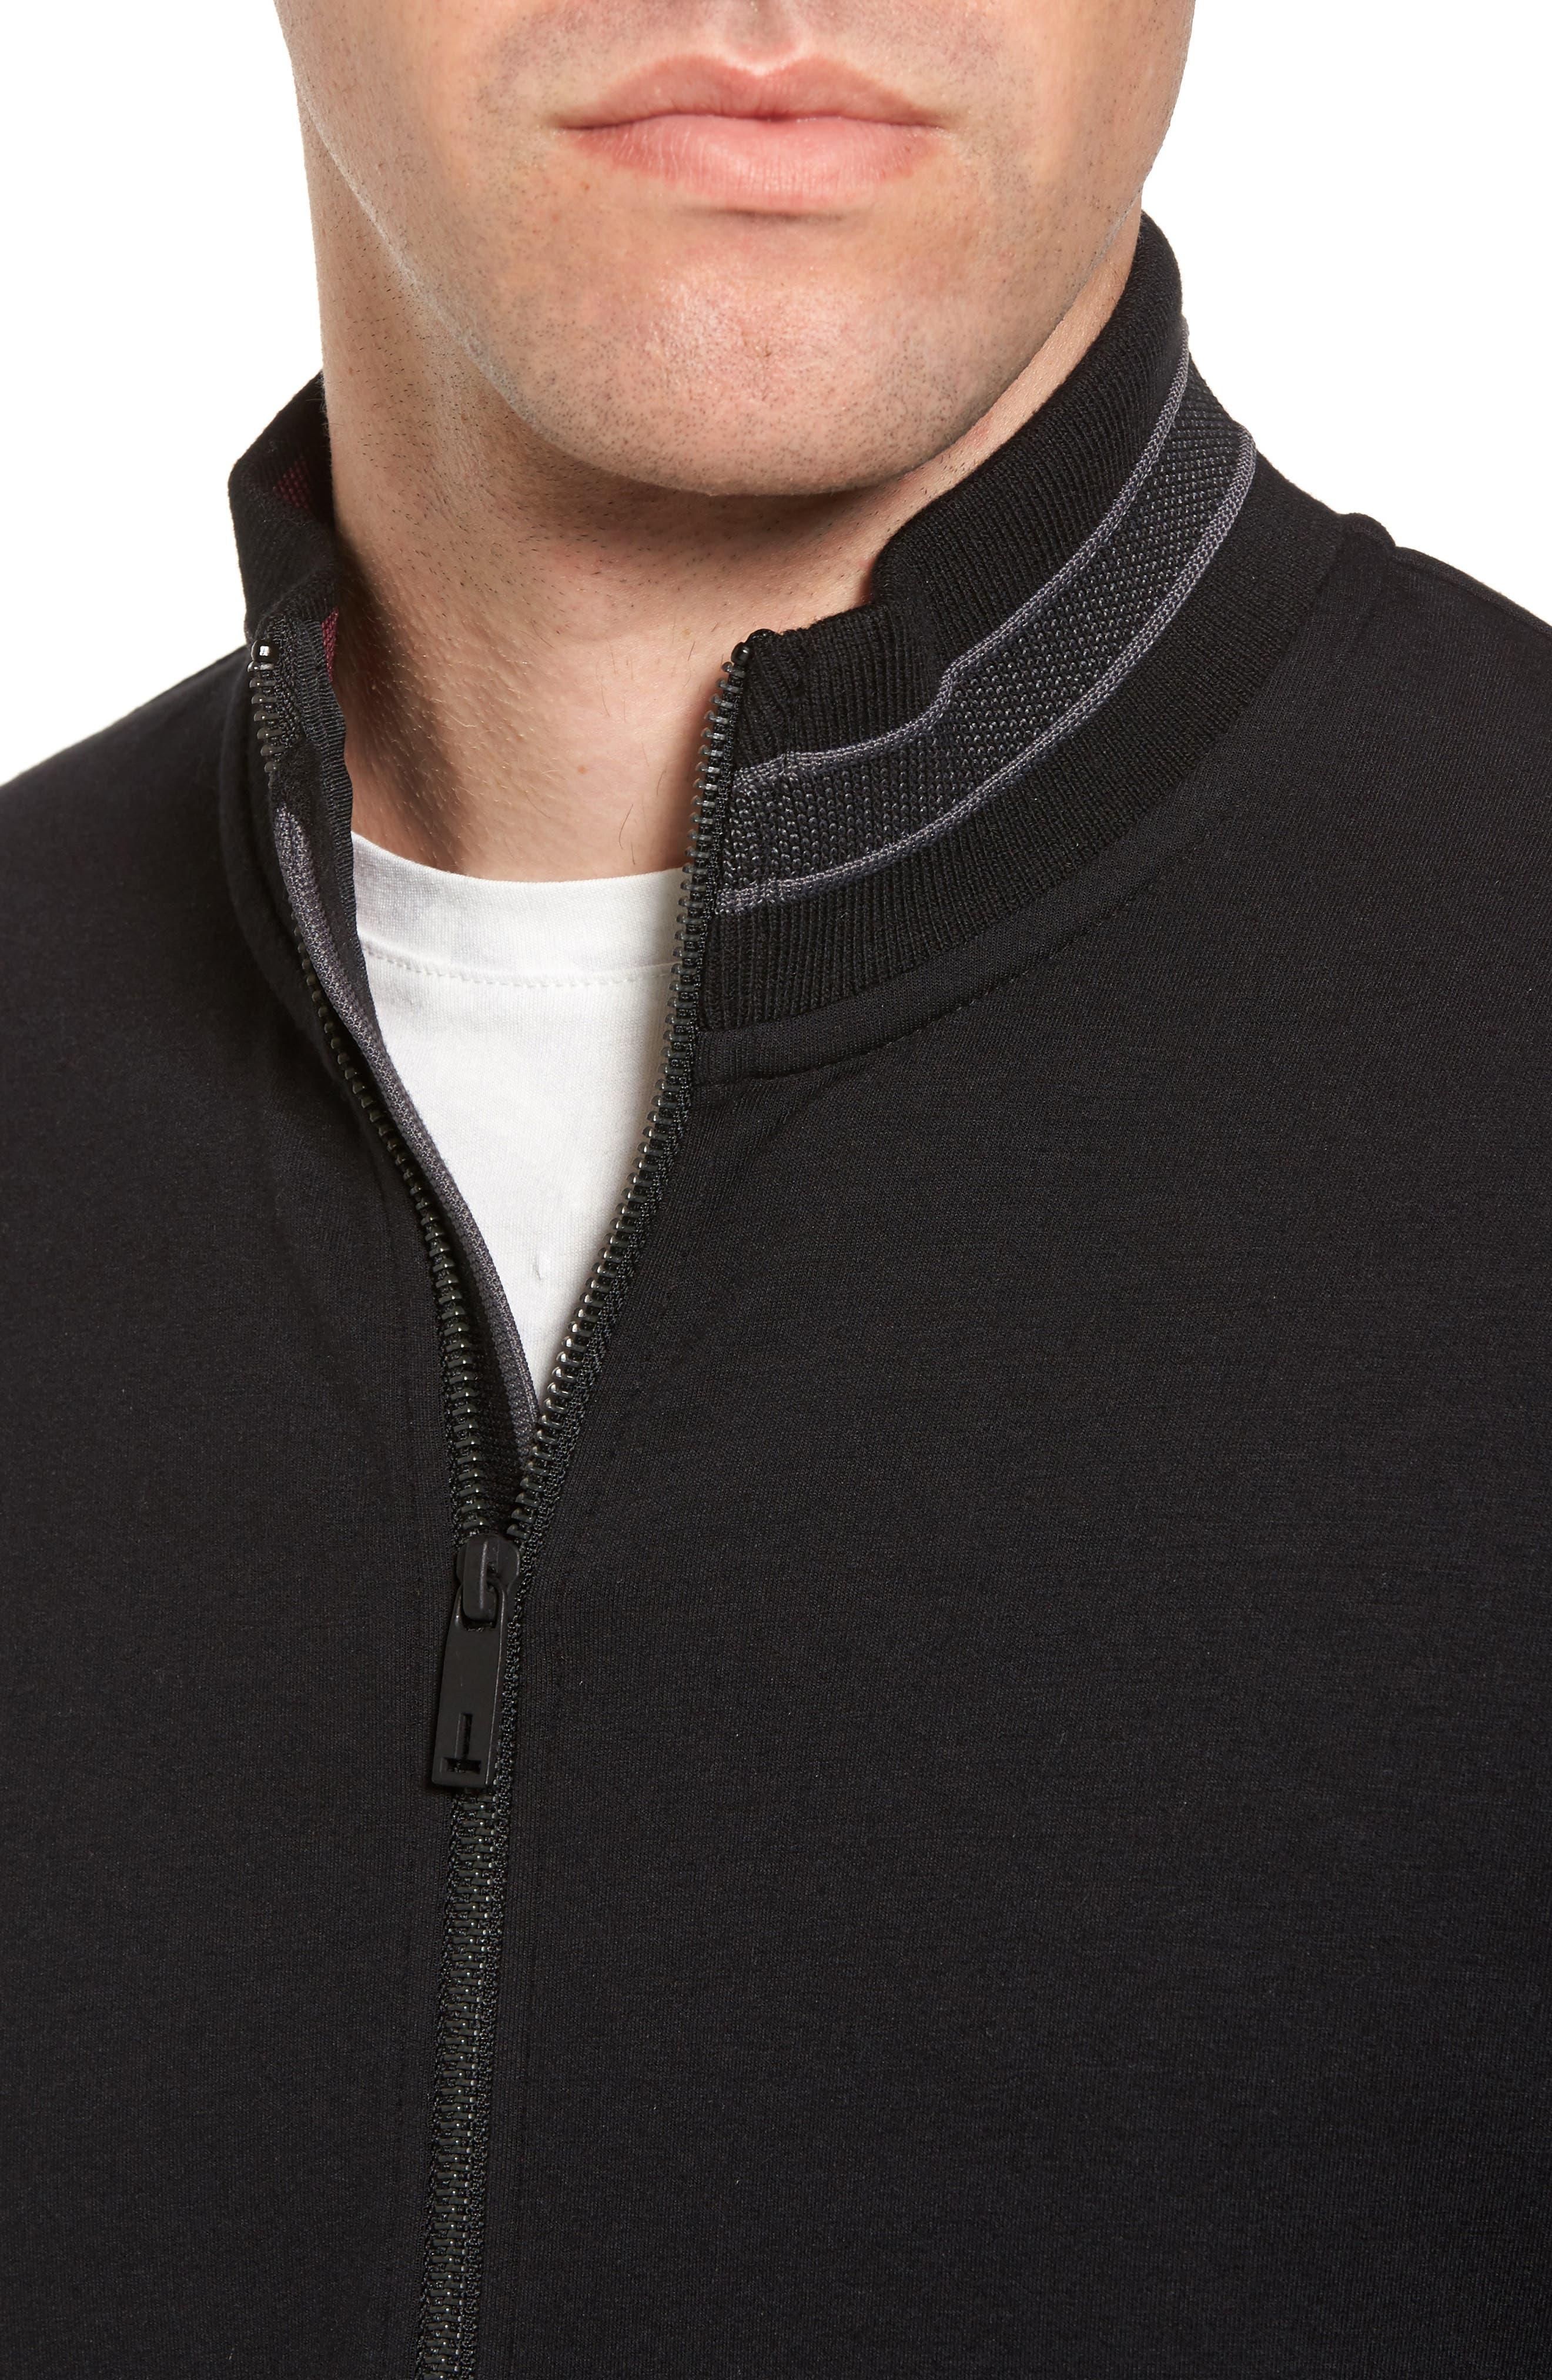 Collie Jersey Zip Jacket,                             Alternate thumbnail 4, color,                             001